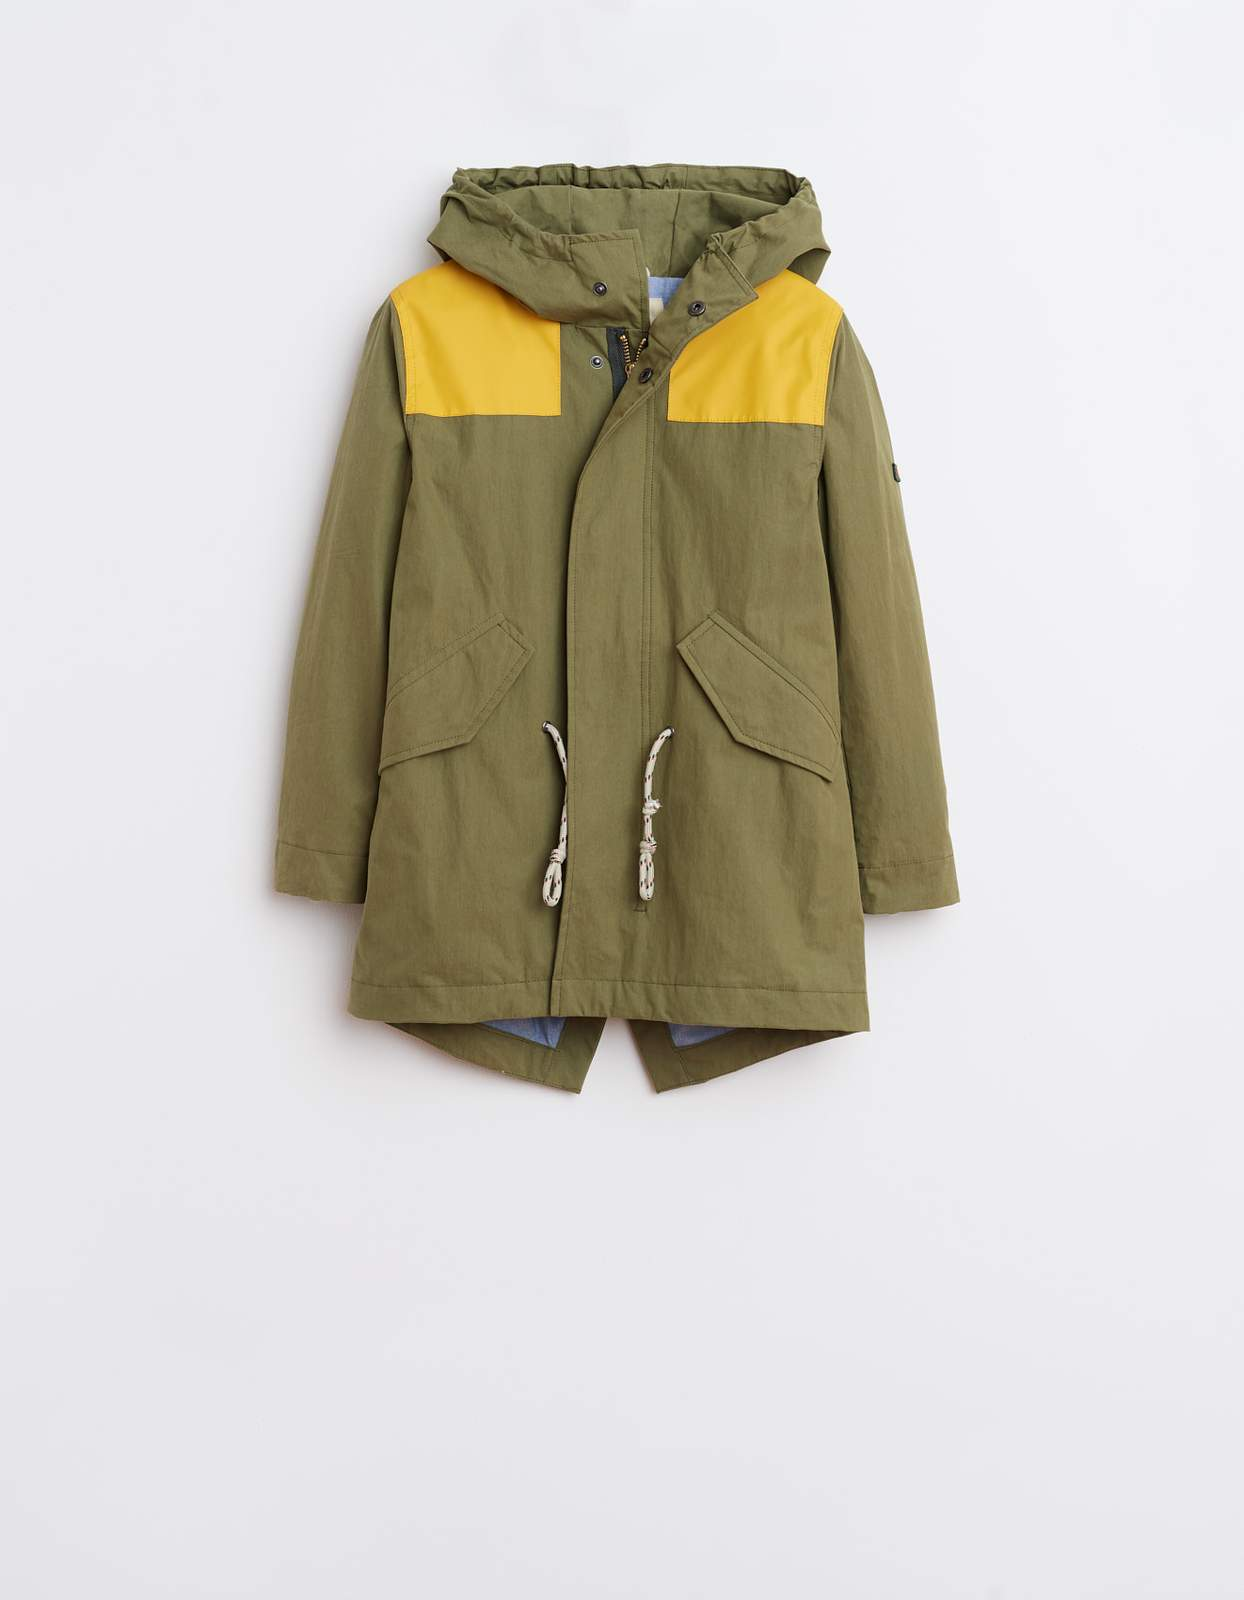 BLR-Hynno-P1009-jeep-jacket_3_1600x1600.jpg